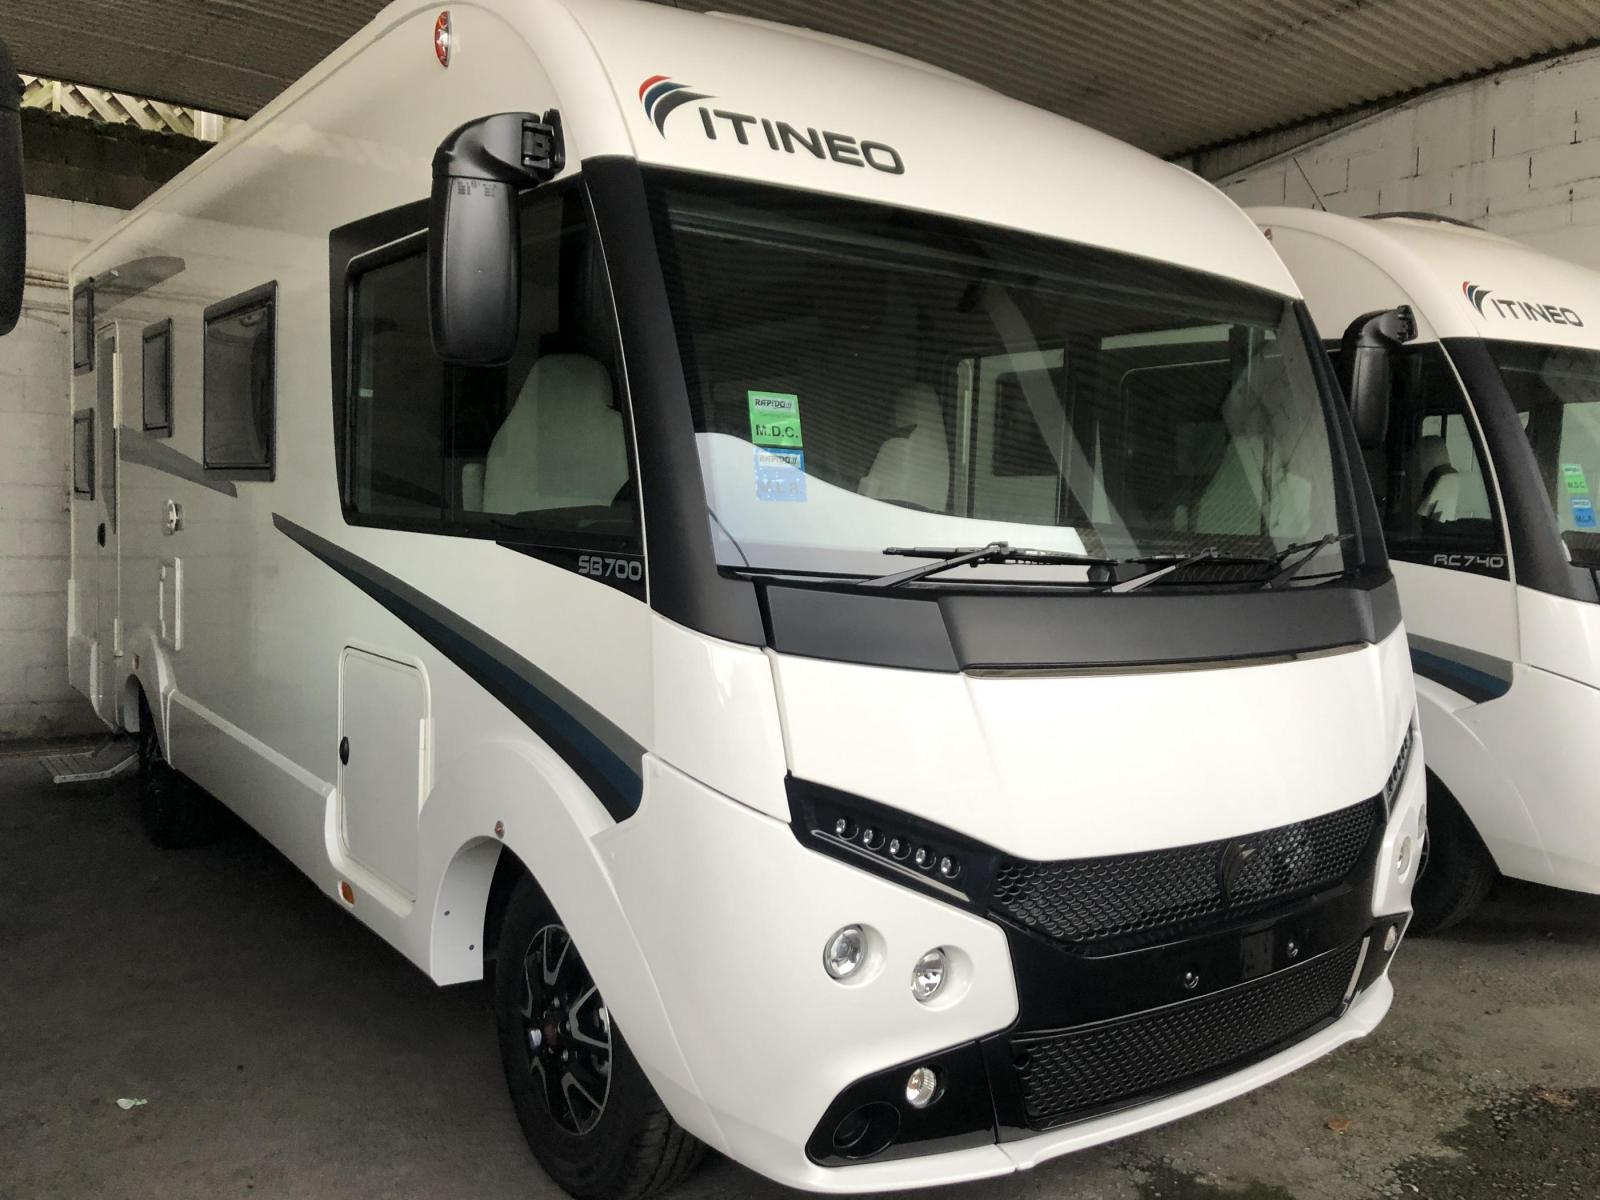 Itineo SB700 2020 By Rapido